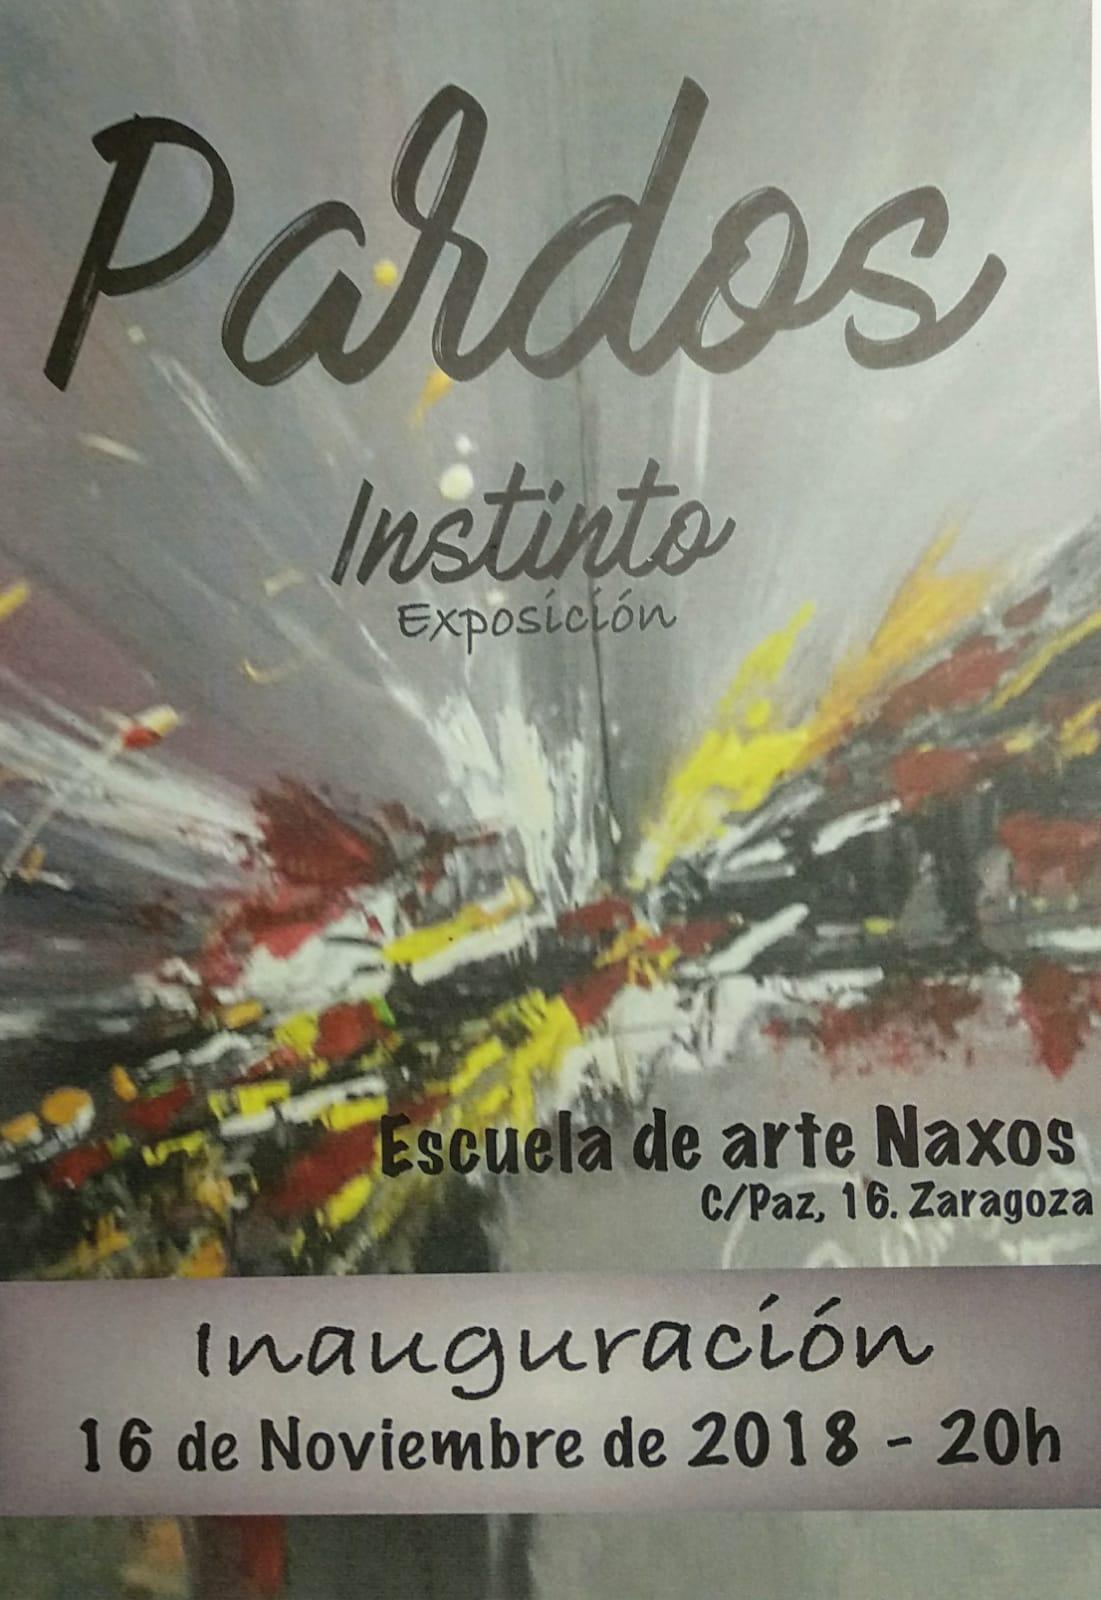 INSTINTO. ESPERANZA PARDOS. PRÓXIMA EXPOSICIÓN DE ARTE EN NAXOS